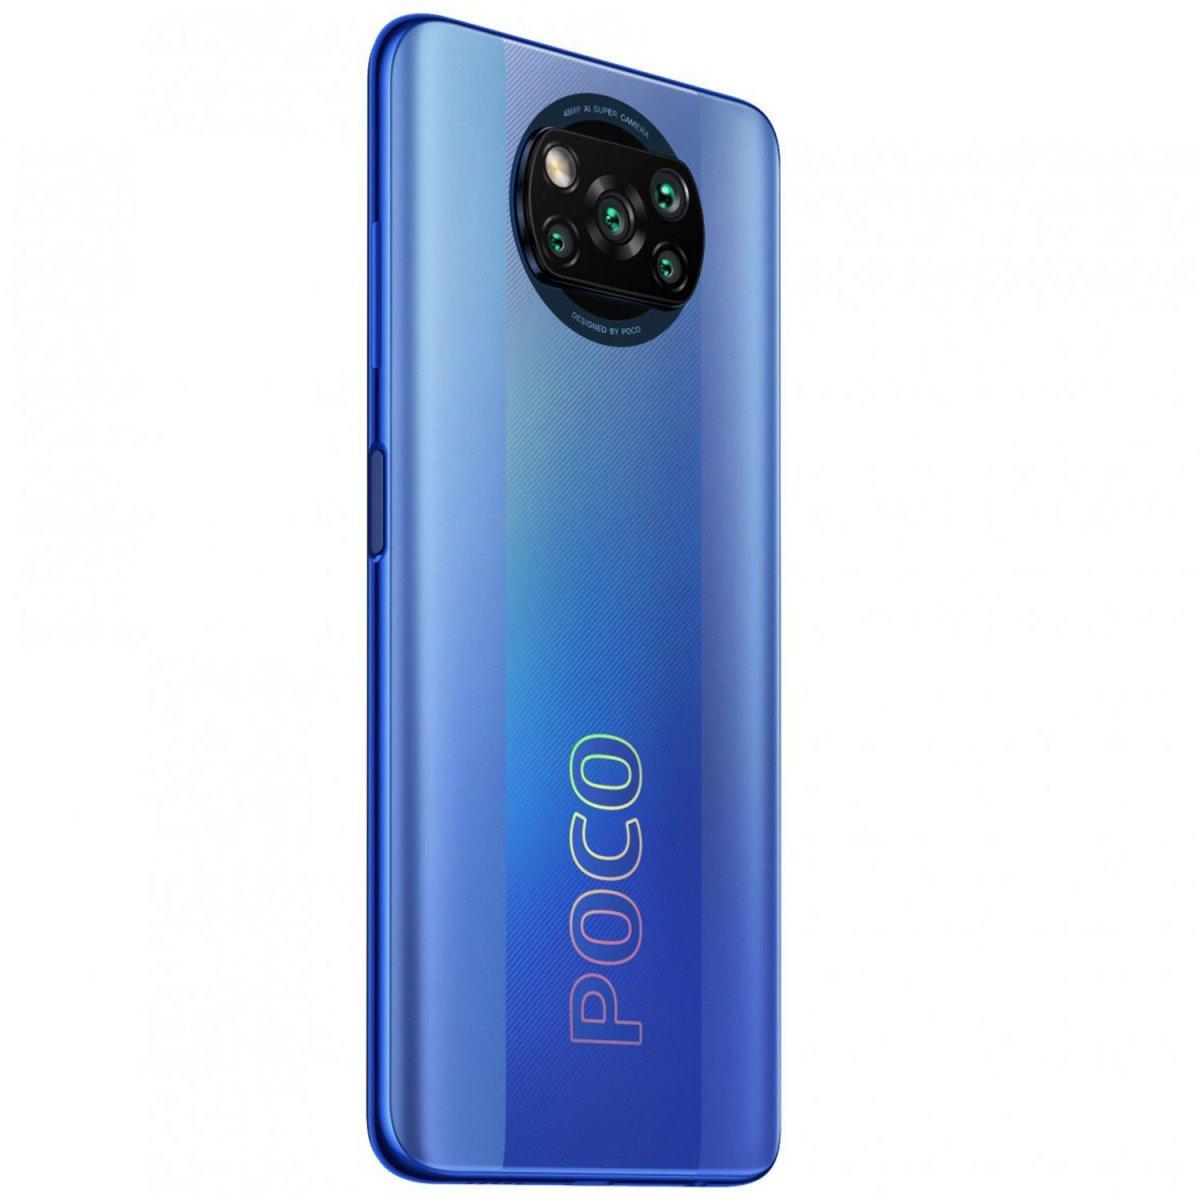 Smartphone Xiaomi Poco X3 Pro - 6/128GB 6.67'' Dual-Sim NFC Frost Blue